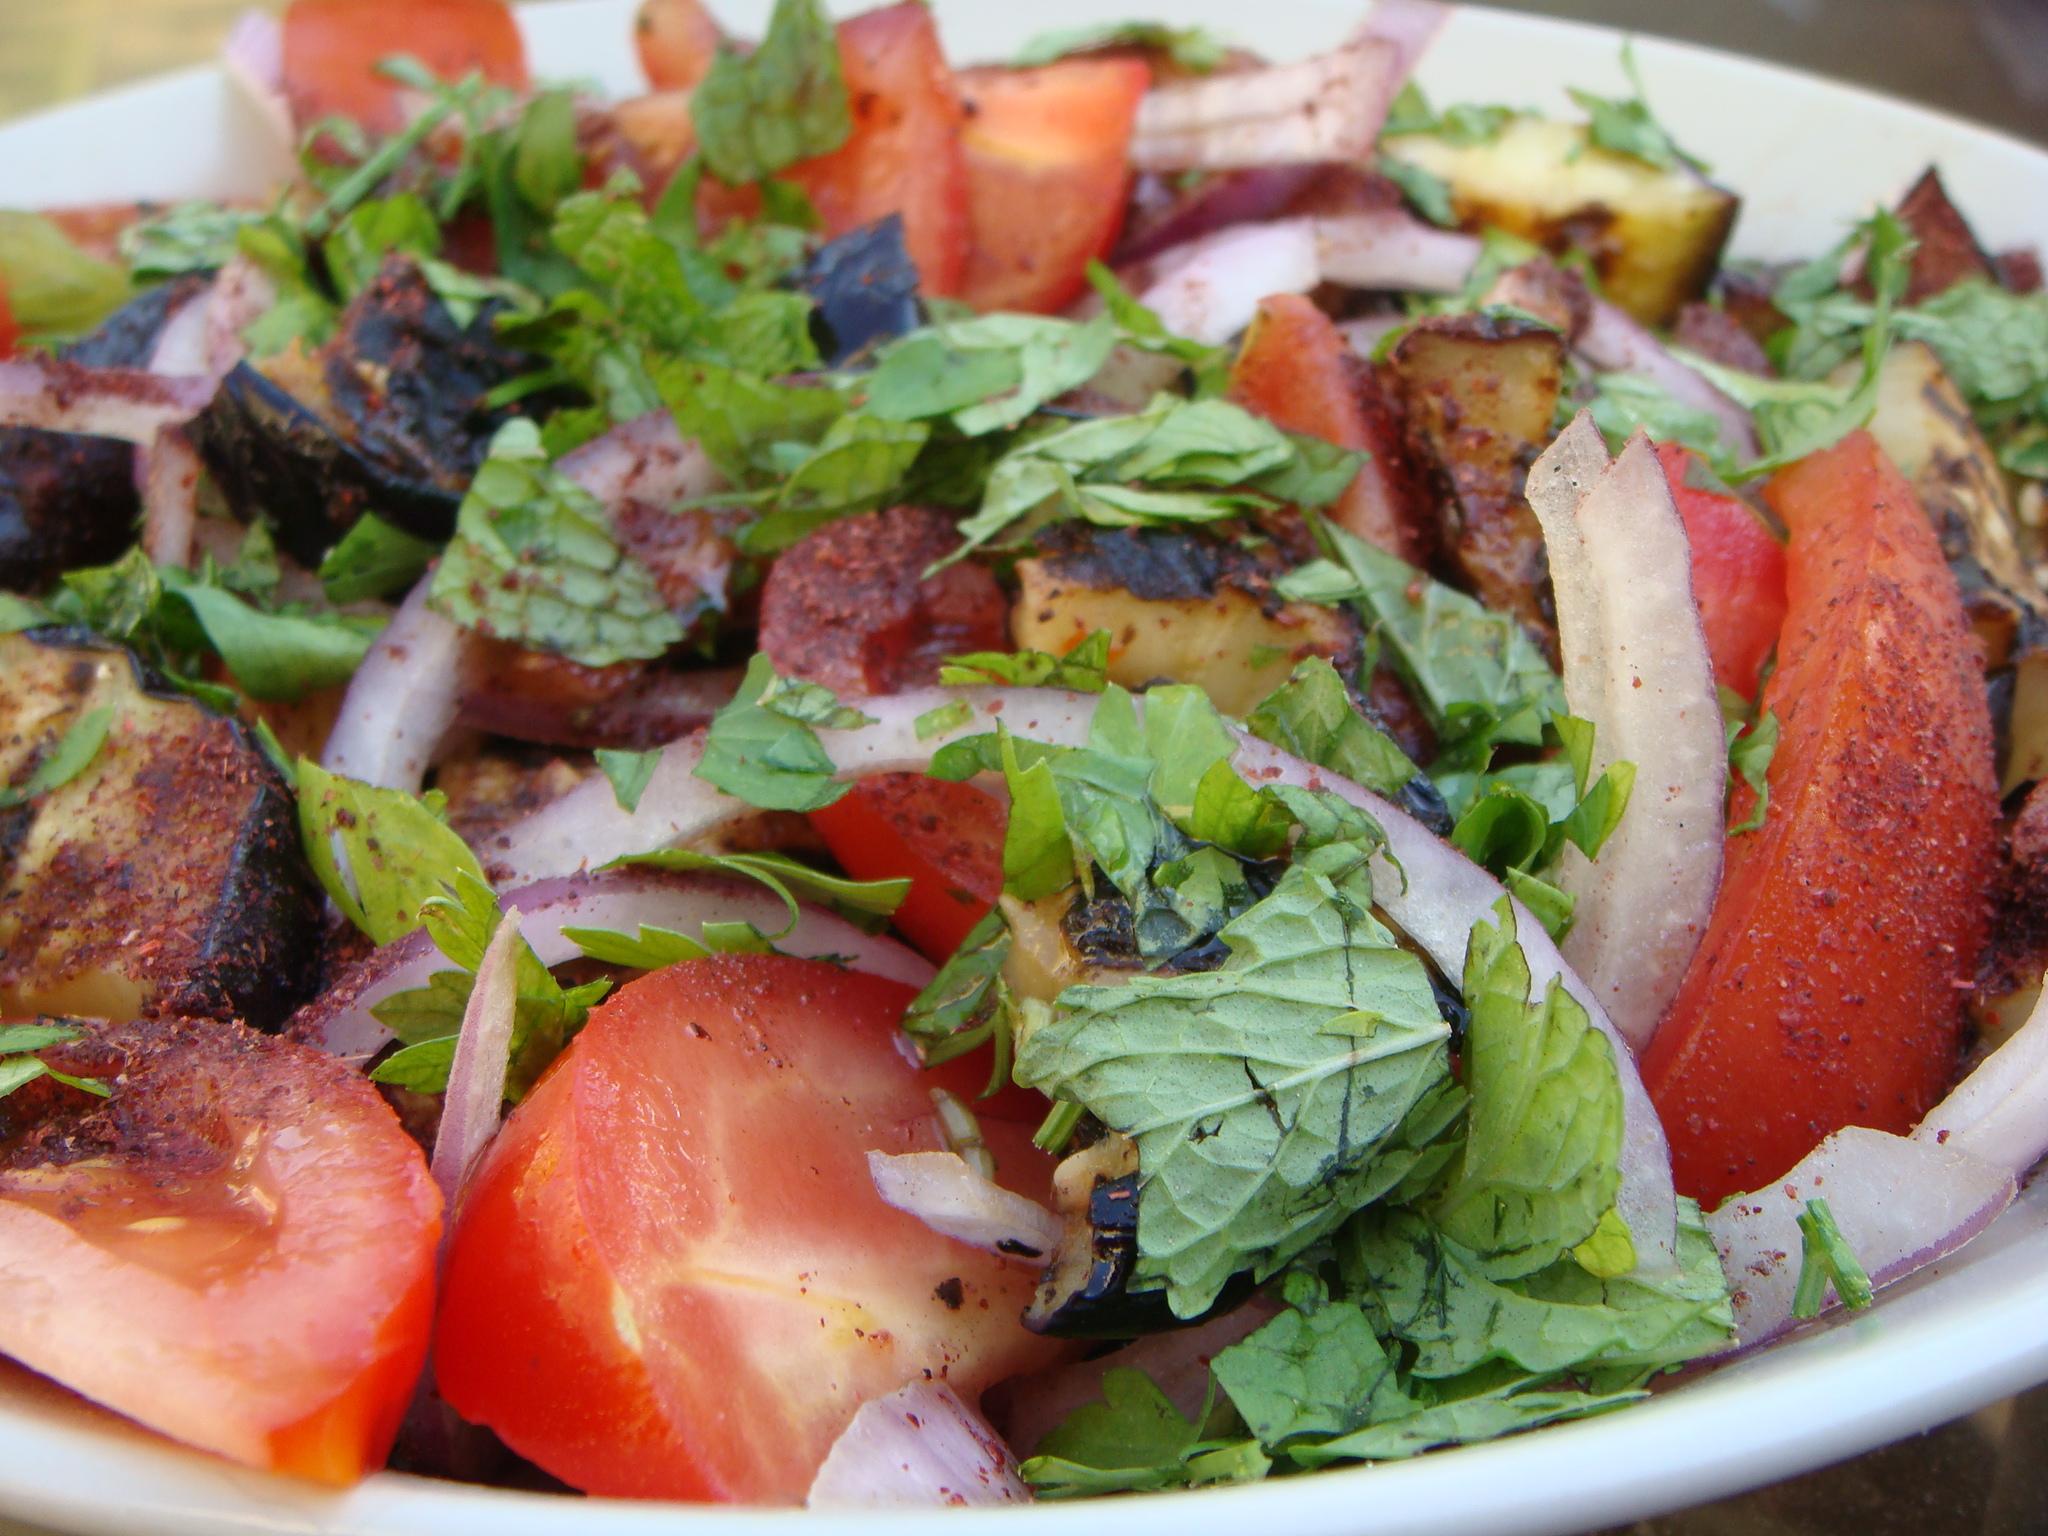 Aubergine (Eggplant), Tomato and Sumac Salad | Divalicious In Dubai